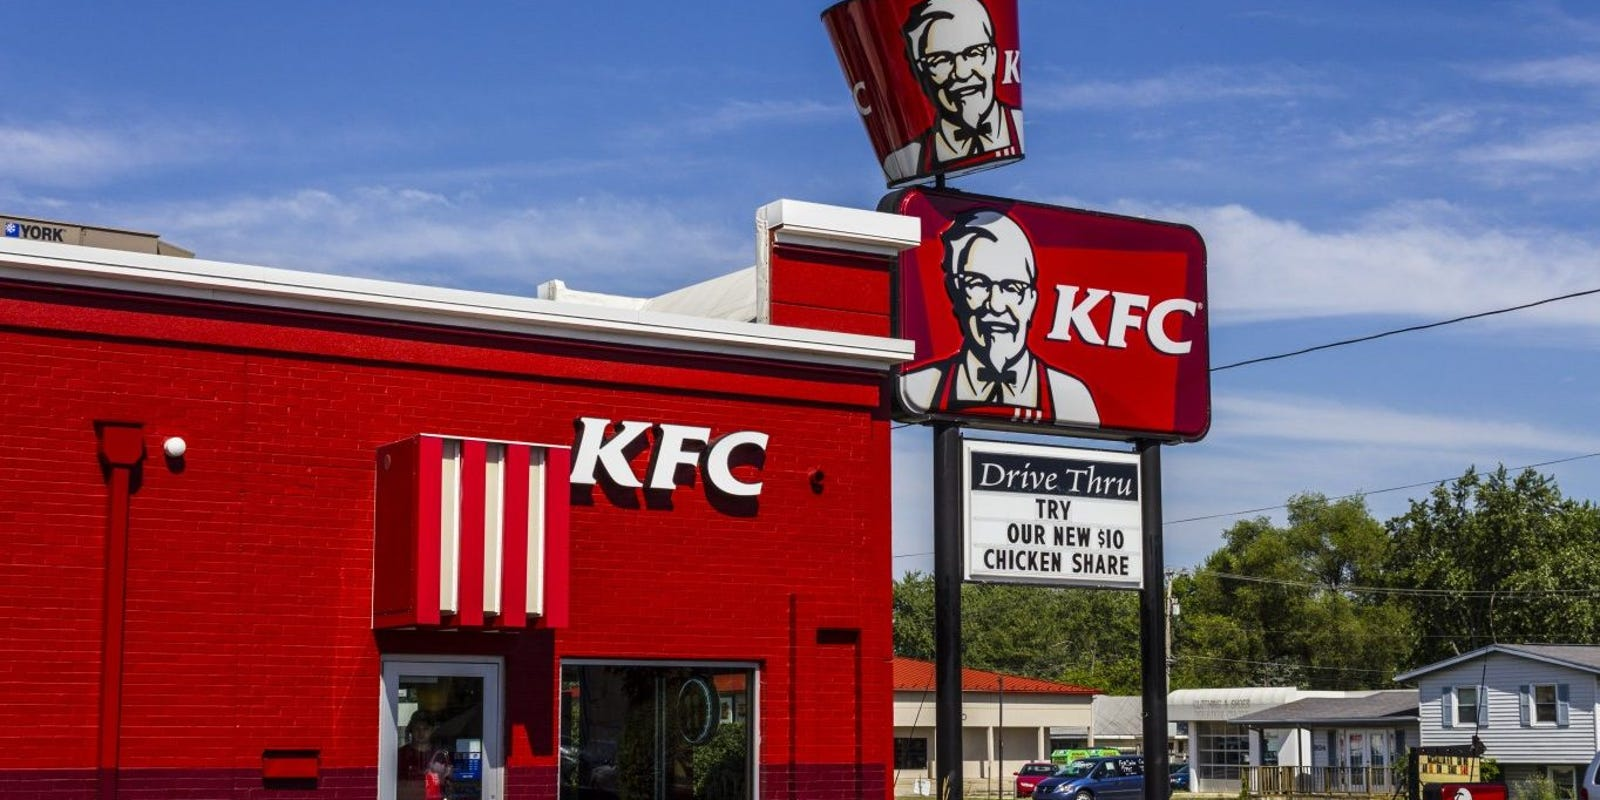 KFC suspending use of 'Finger Lickin' Good' in advertising amid coronavirus pandemic